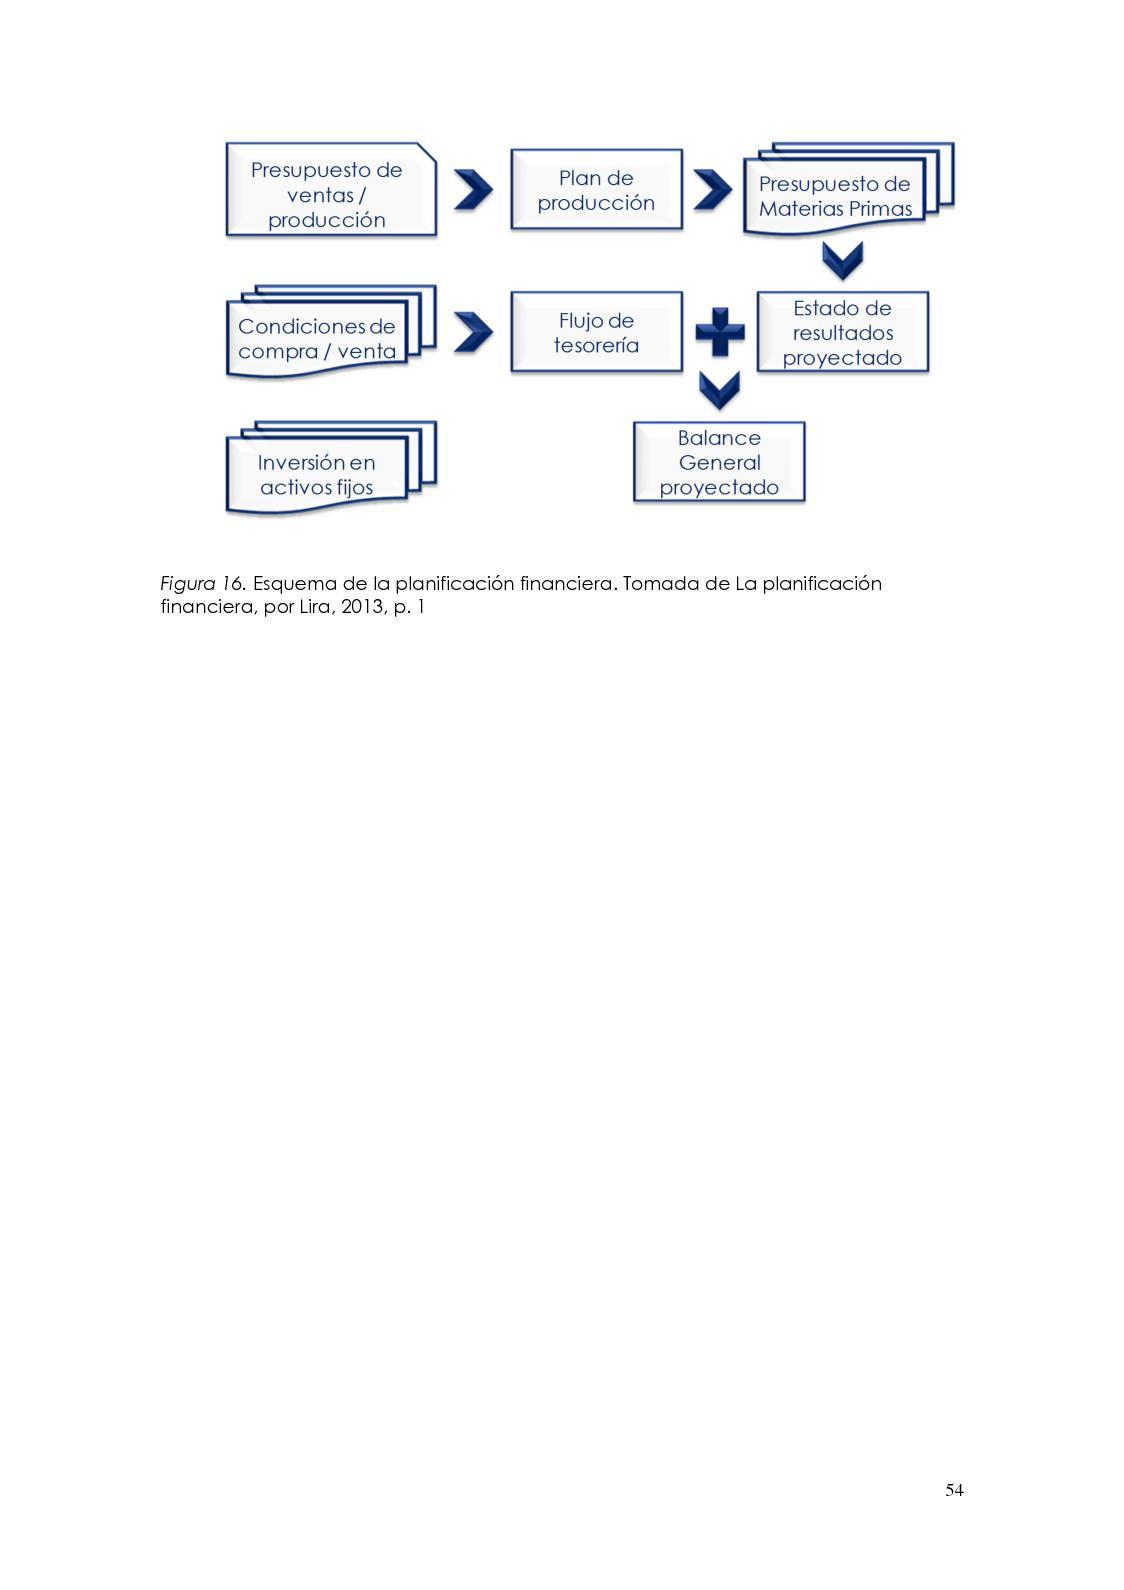 Finanzas corporativas uc0341 2017 ok calameo downloader page 54 ccuart Images